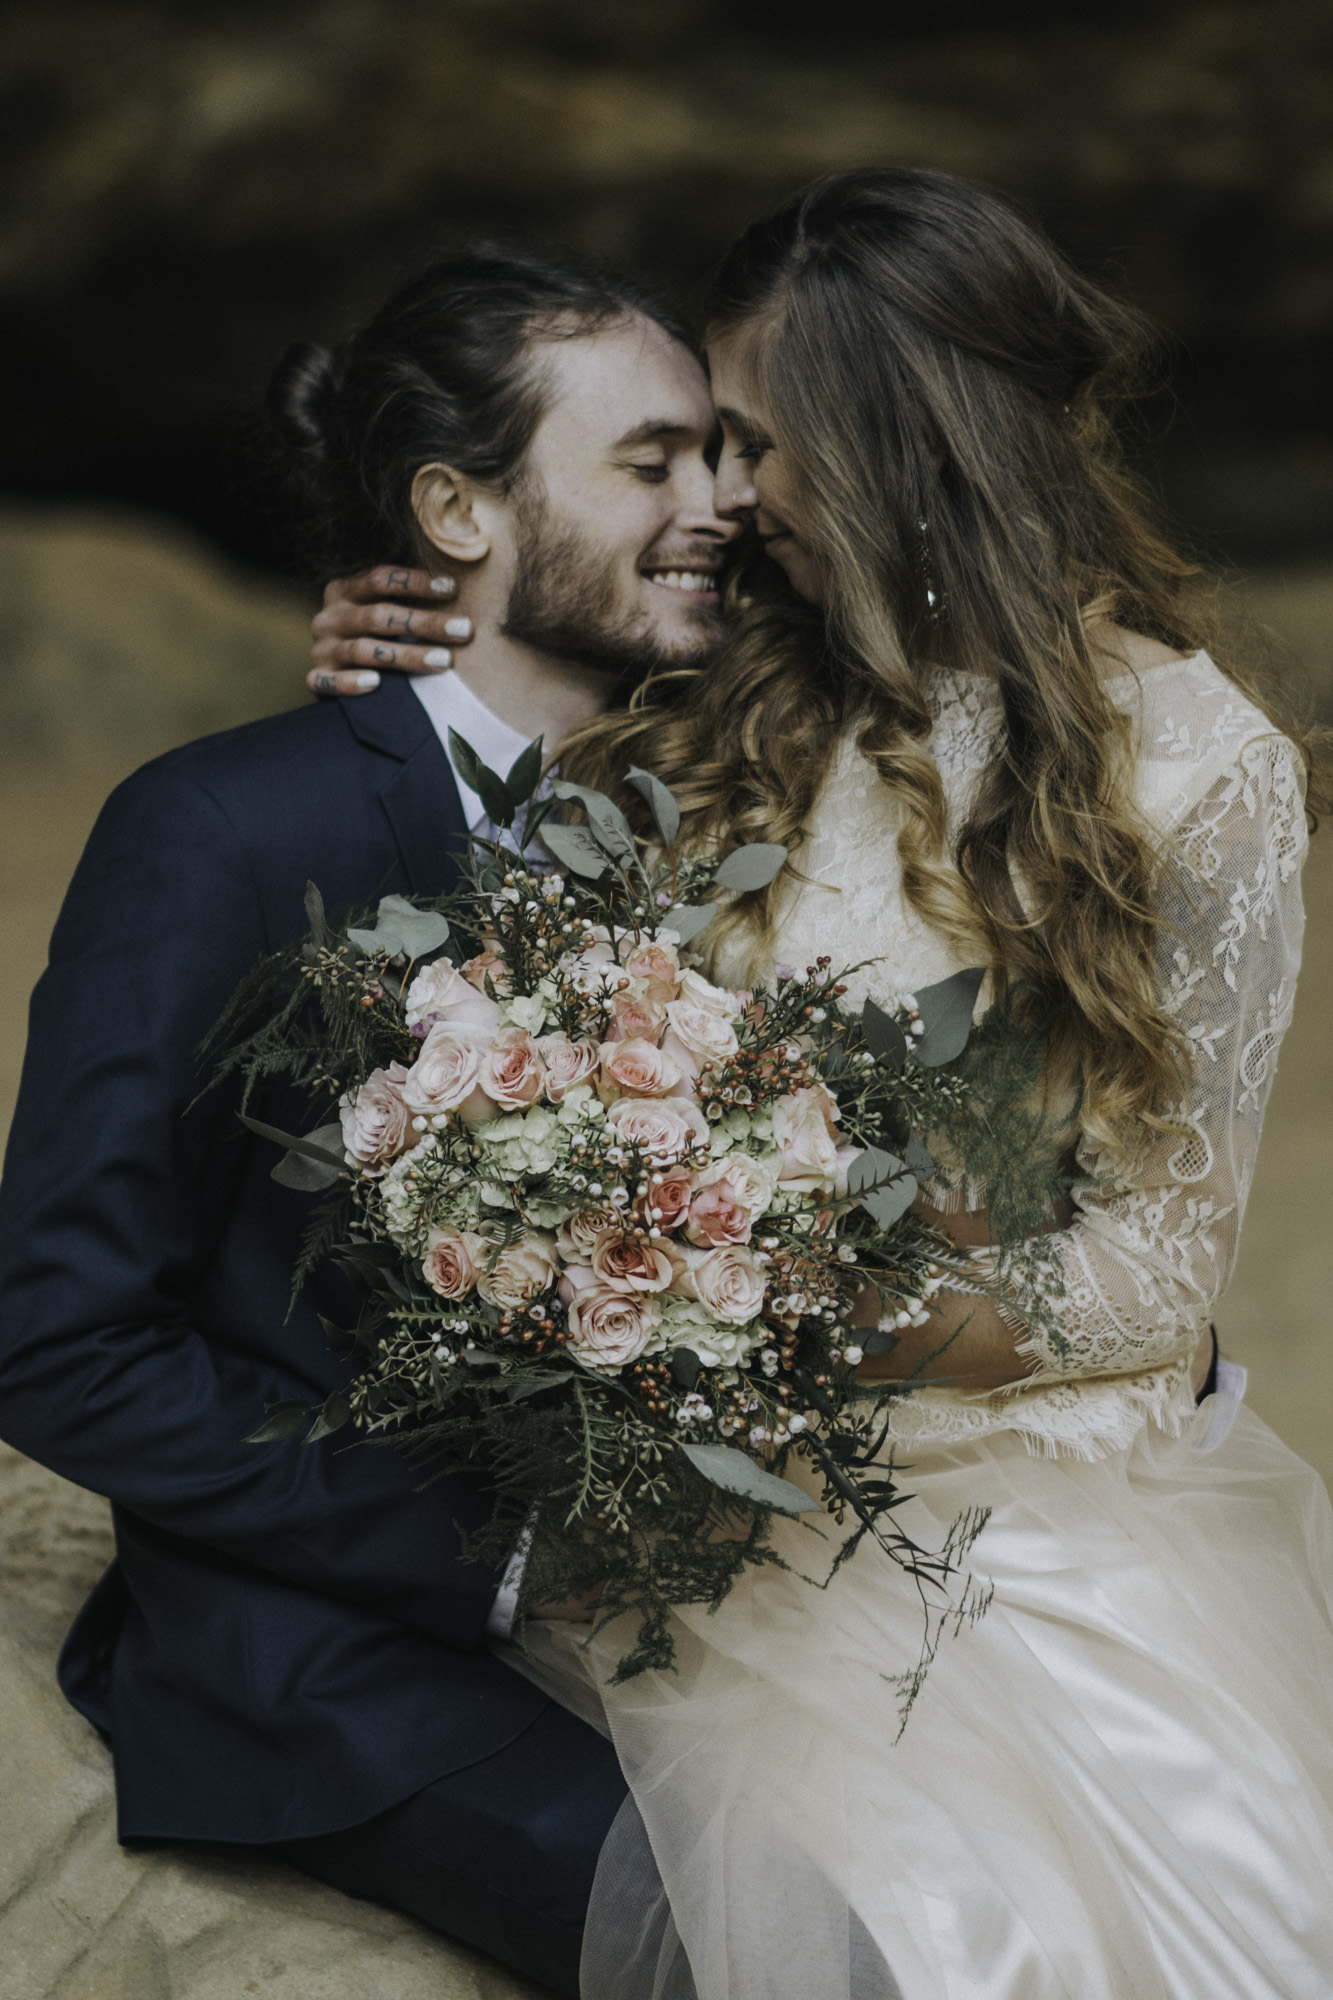 Cate_Ann_Photography_Dayton_Ohio_Wedding_Elopement_And_Engagement_PhotographerDSC_5986.jpg